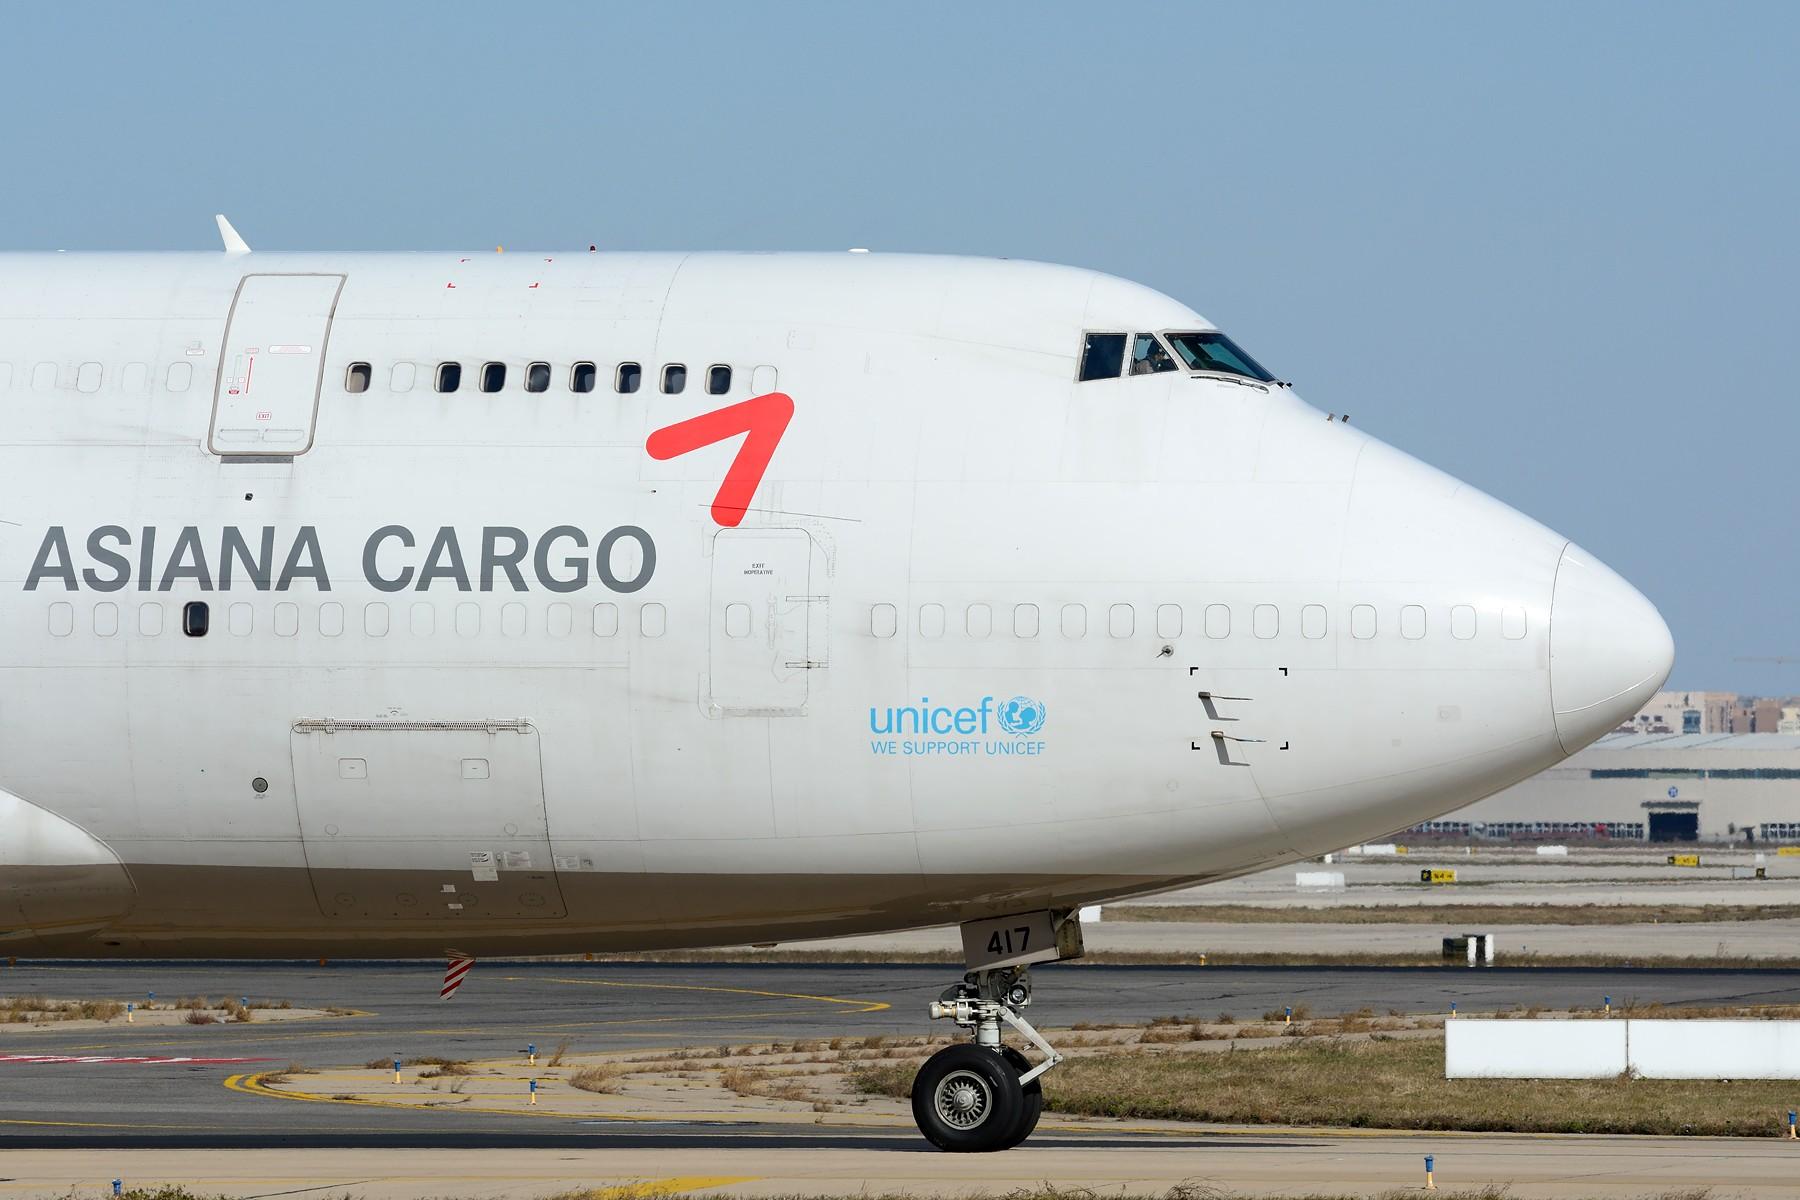 Re:[原创]【TSN】继续冷饭之各类卡狗 BOEING 747-400 HL7417 中国天津滨海国际机场